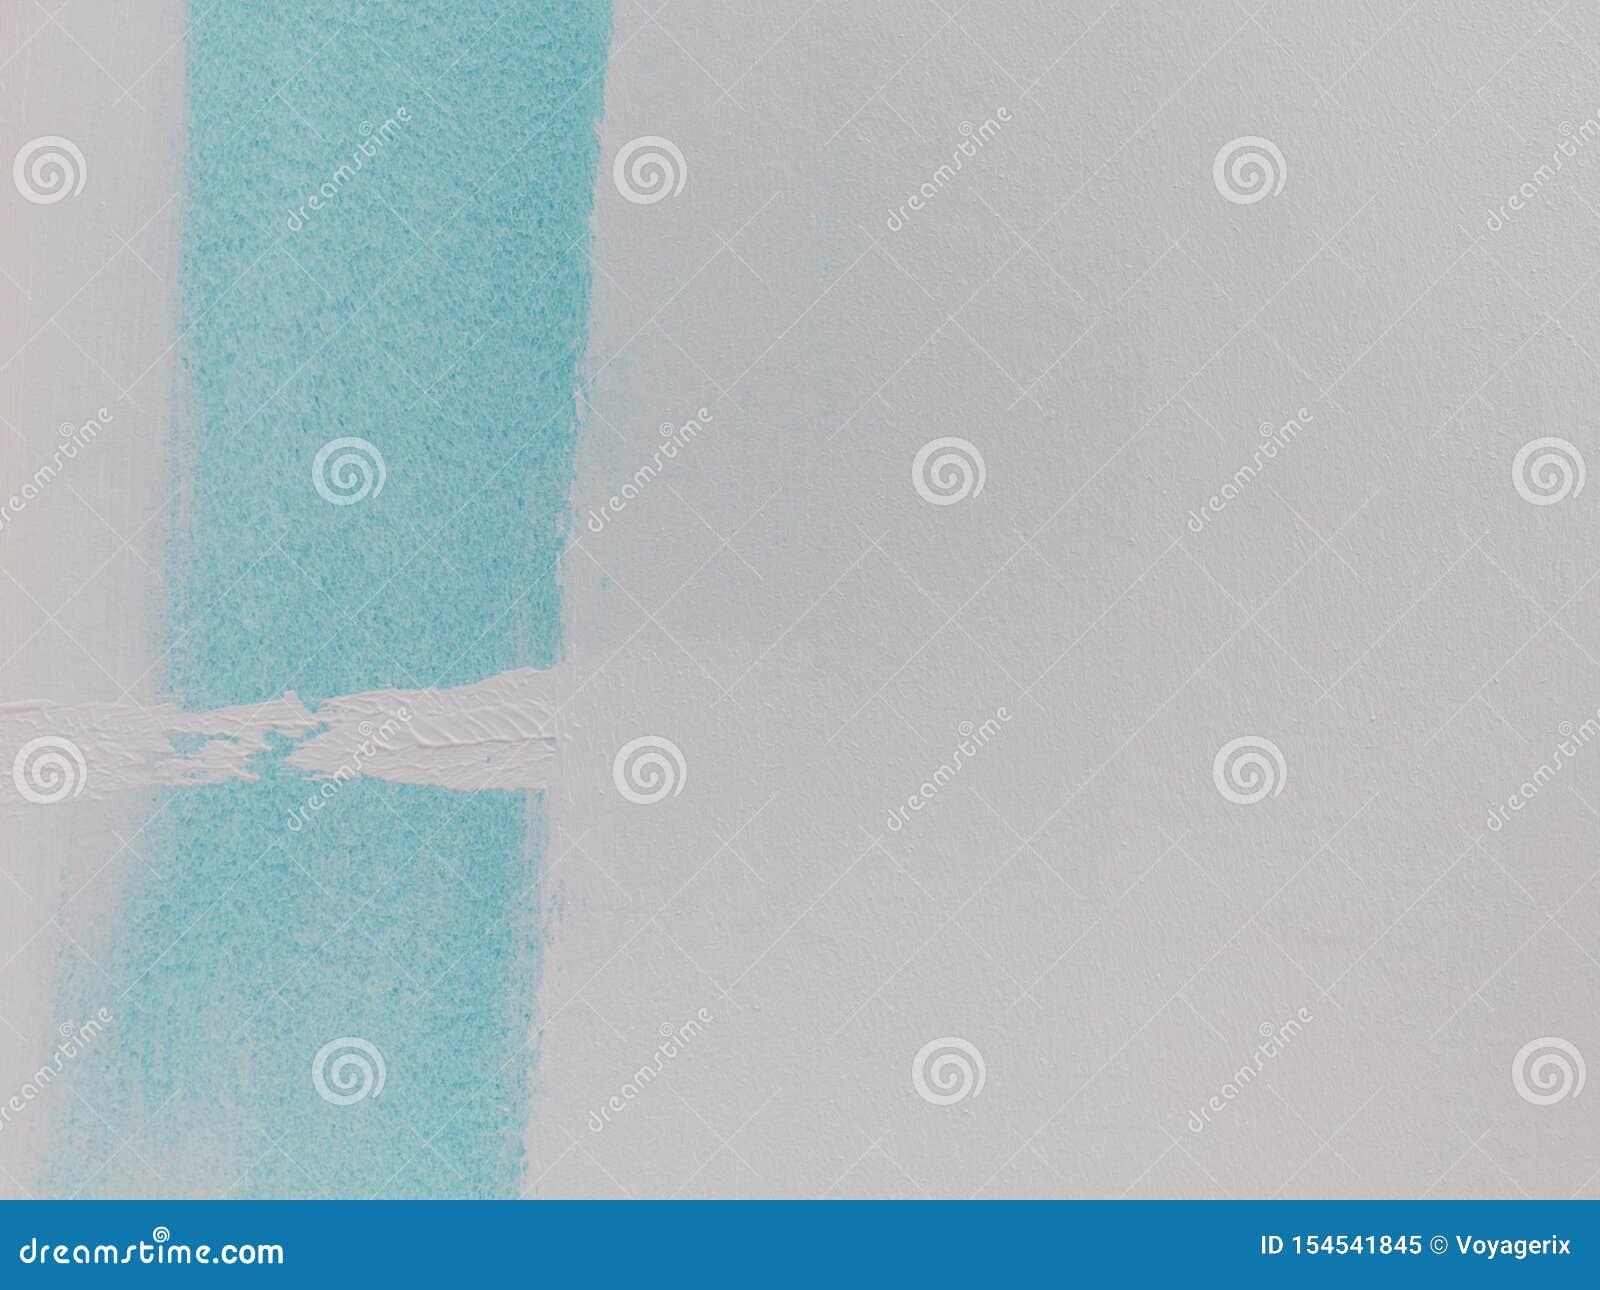 Amostra de folha azul da pintura na parede branca